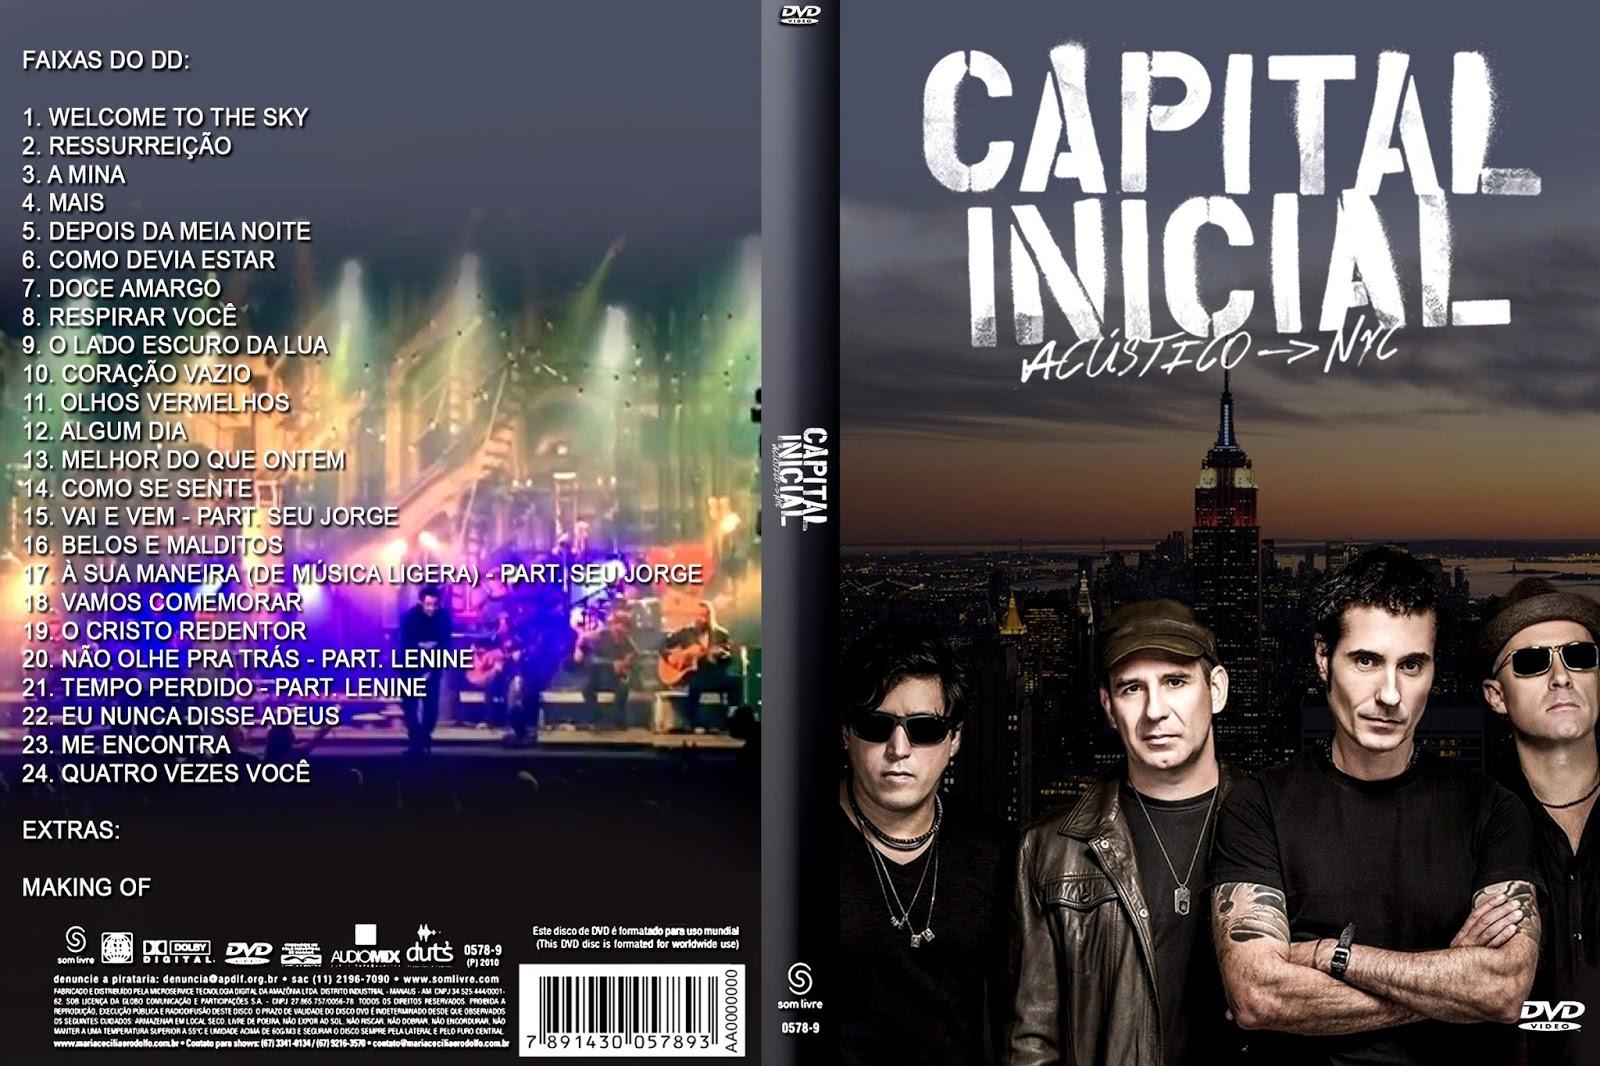 CapitalInicialAcusticoNYC2015